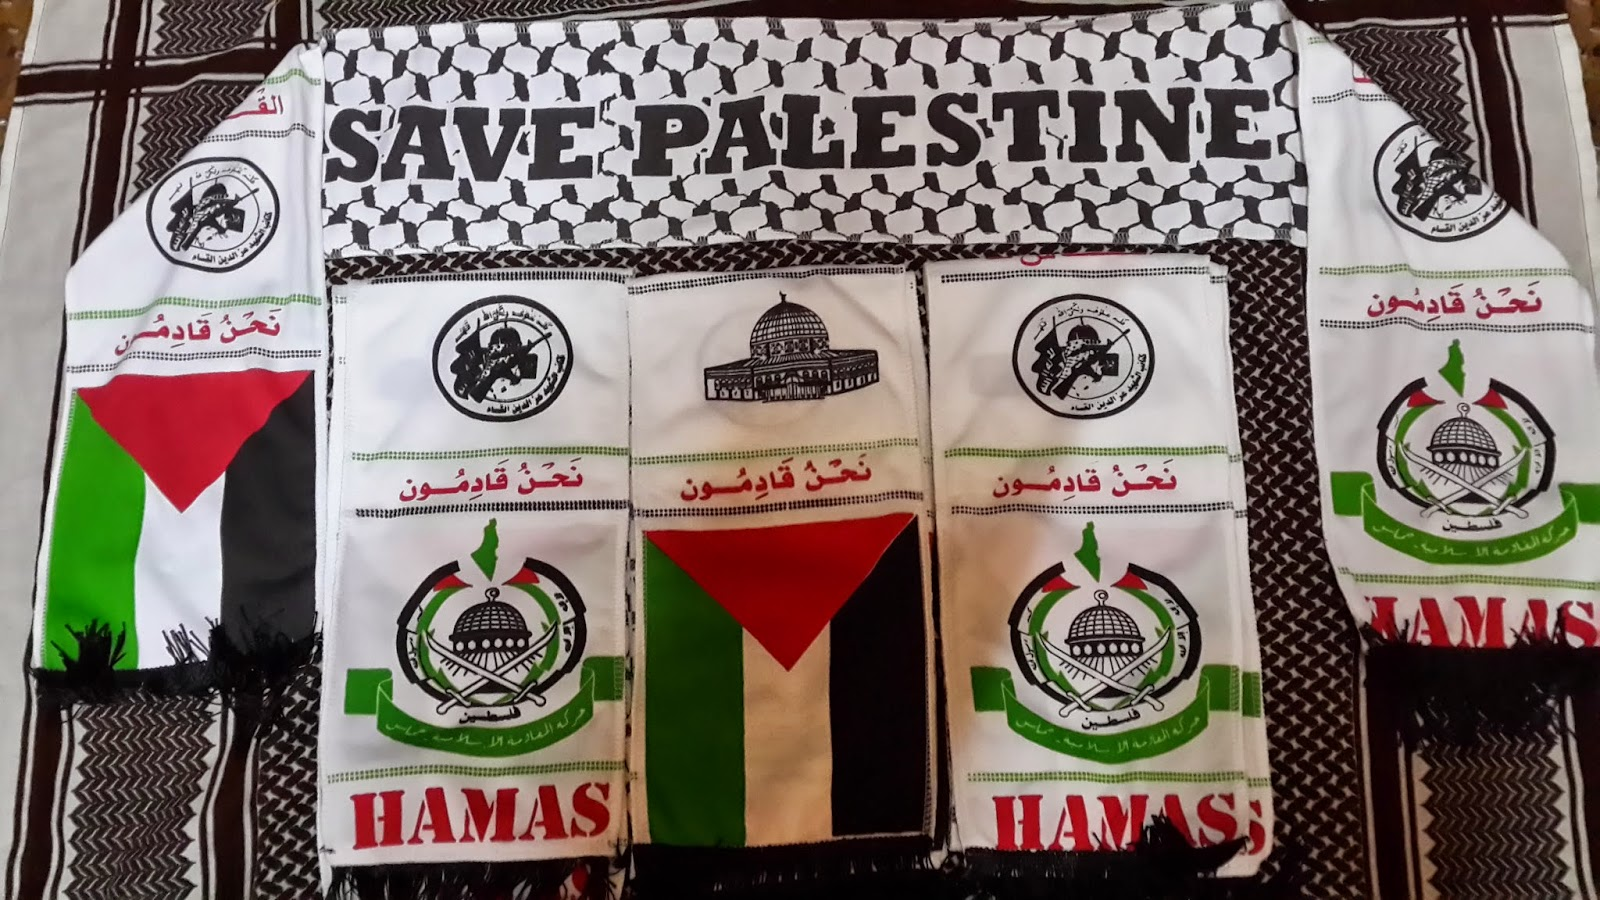 maflastin 'save palestin'